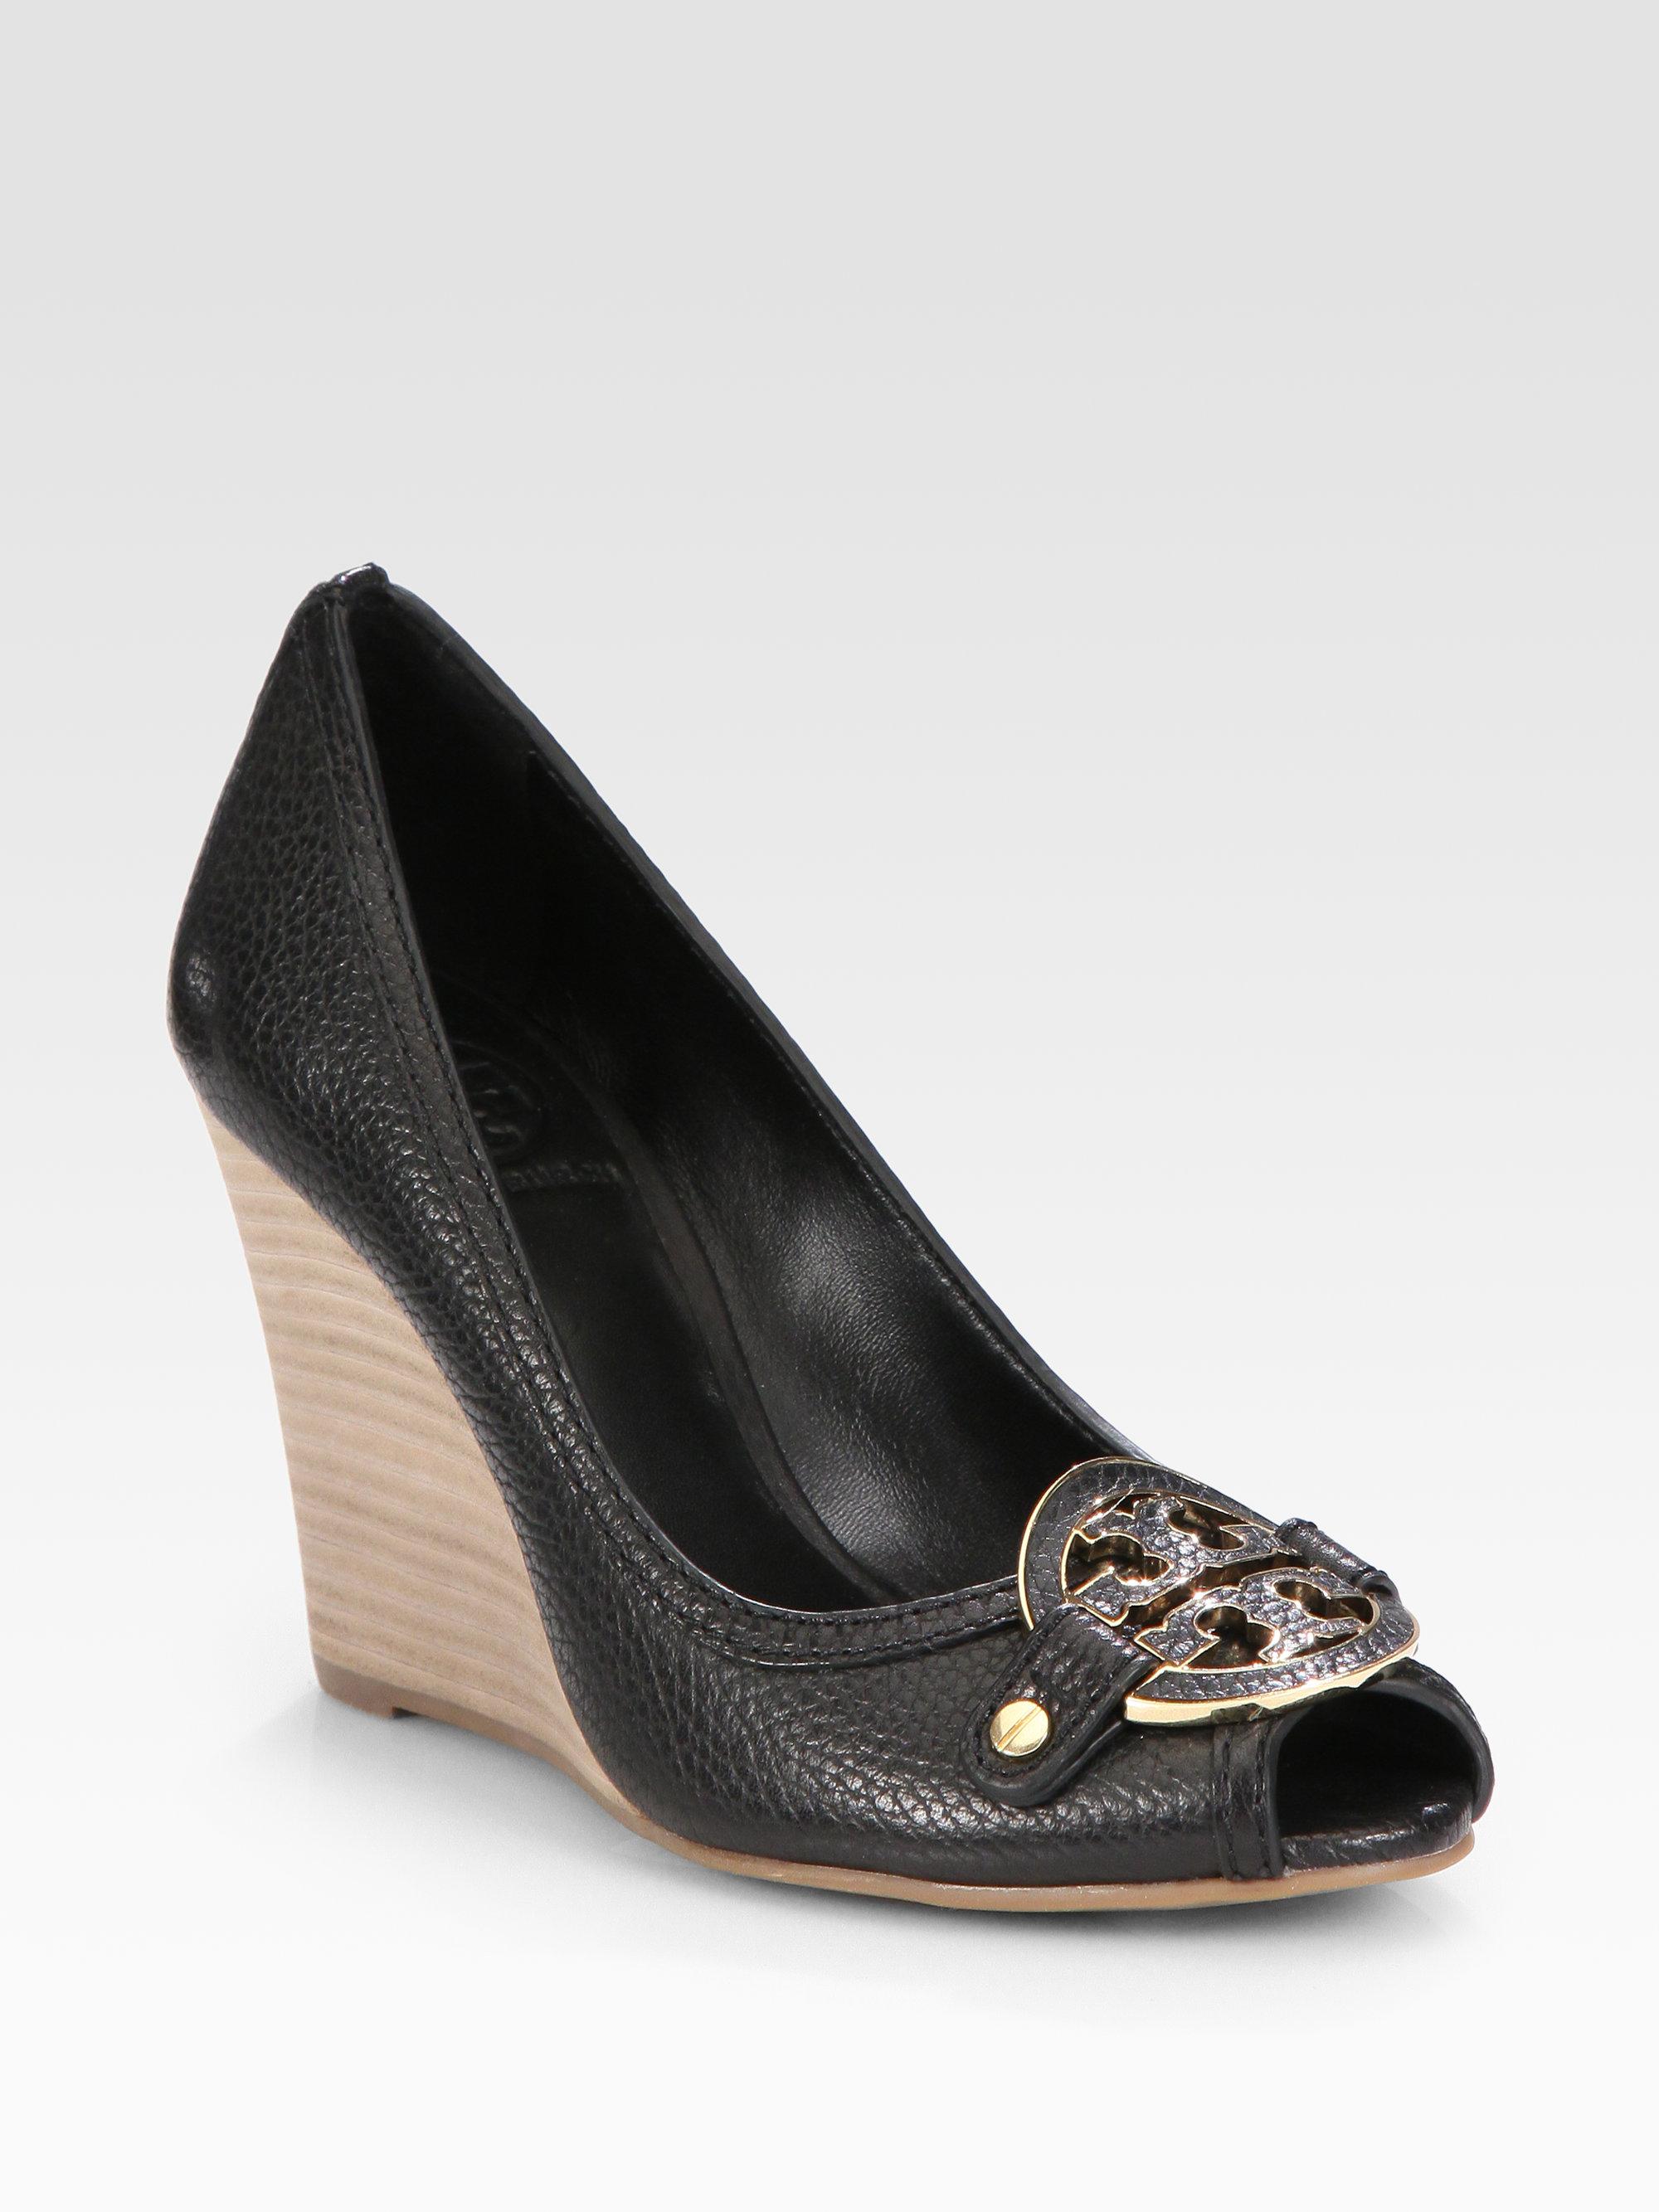 3991aface92 Lyst - Tory Burch Amanda Leather Logo Peep Toe Wedge Pumps in Black